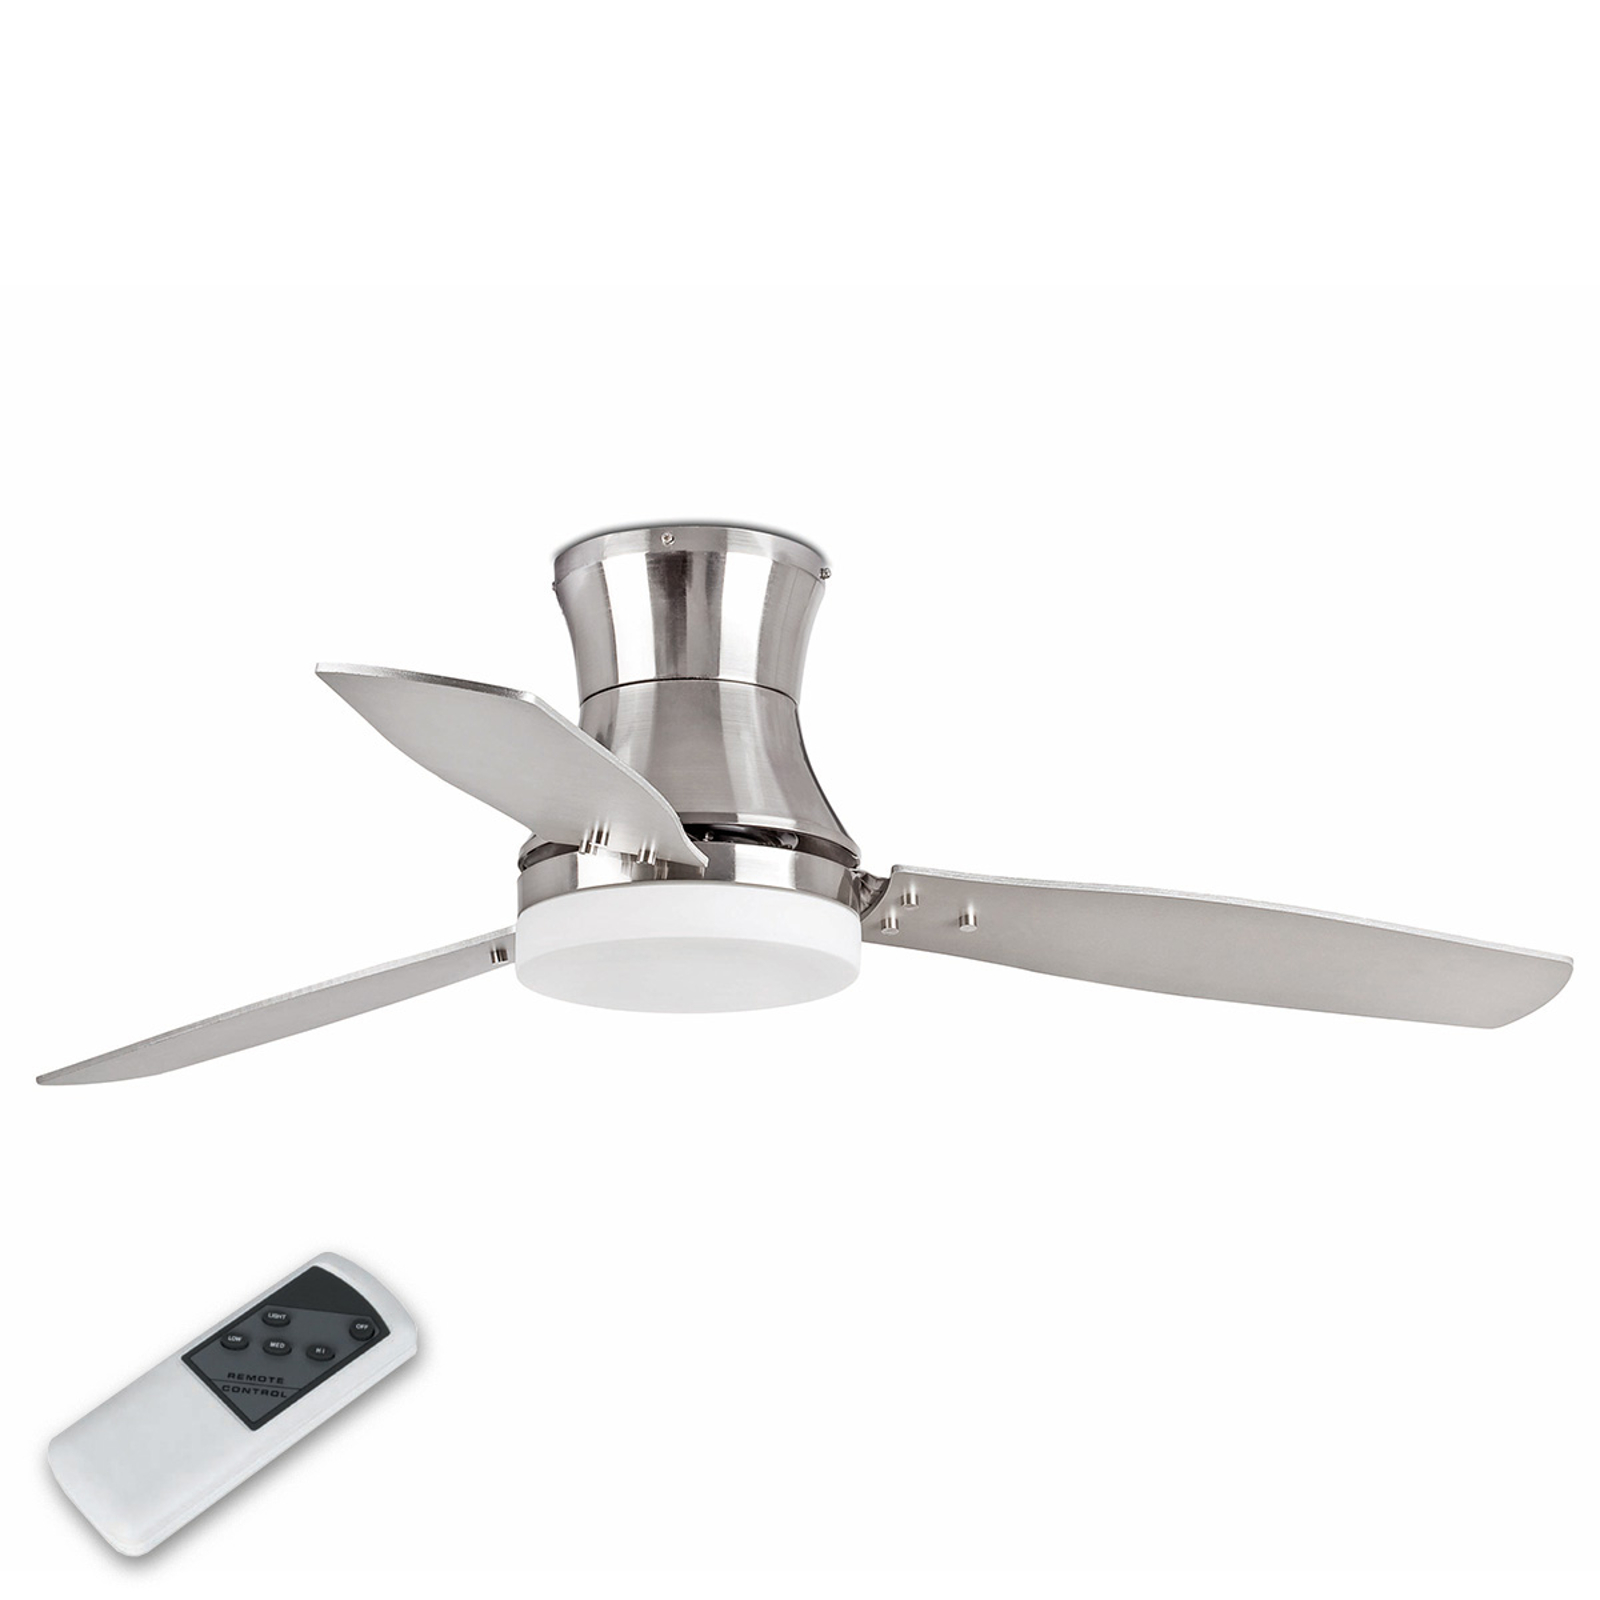 TONSAY Ceiling Fan with Illumination_3506748_1